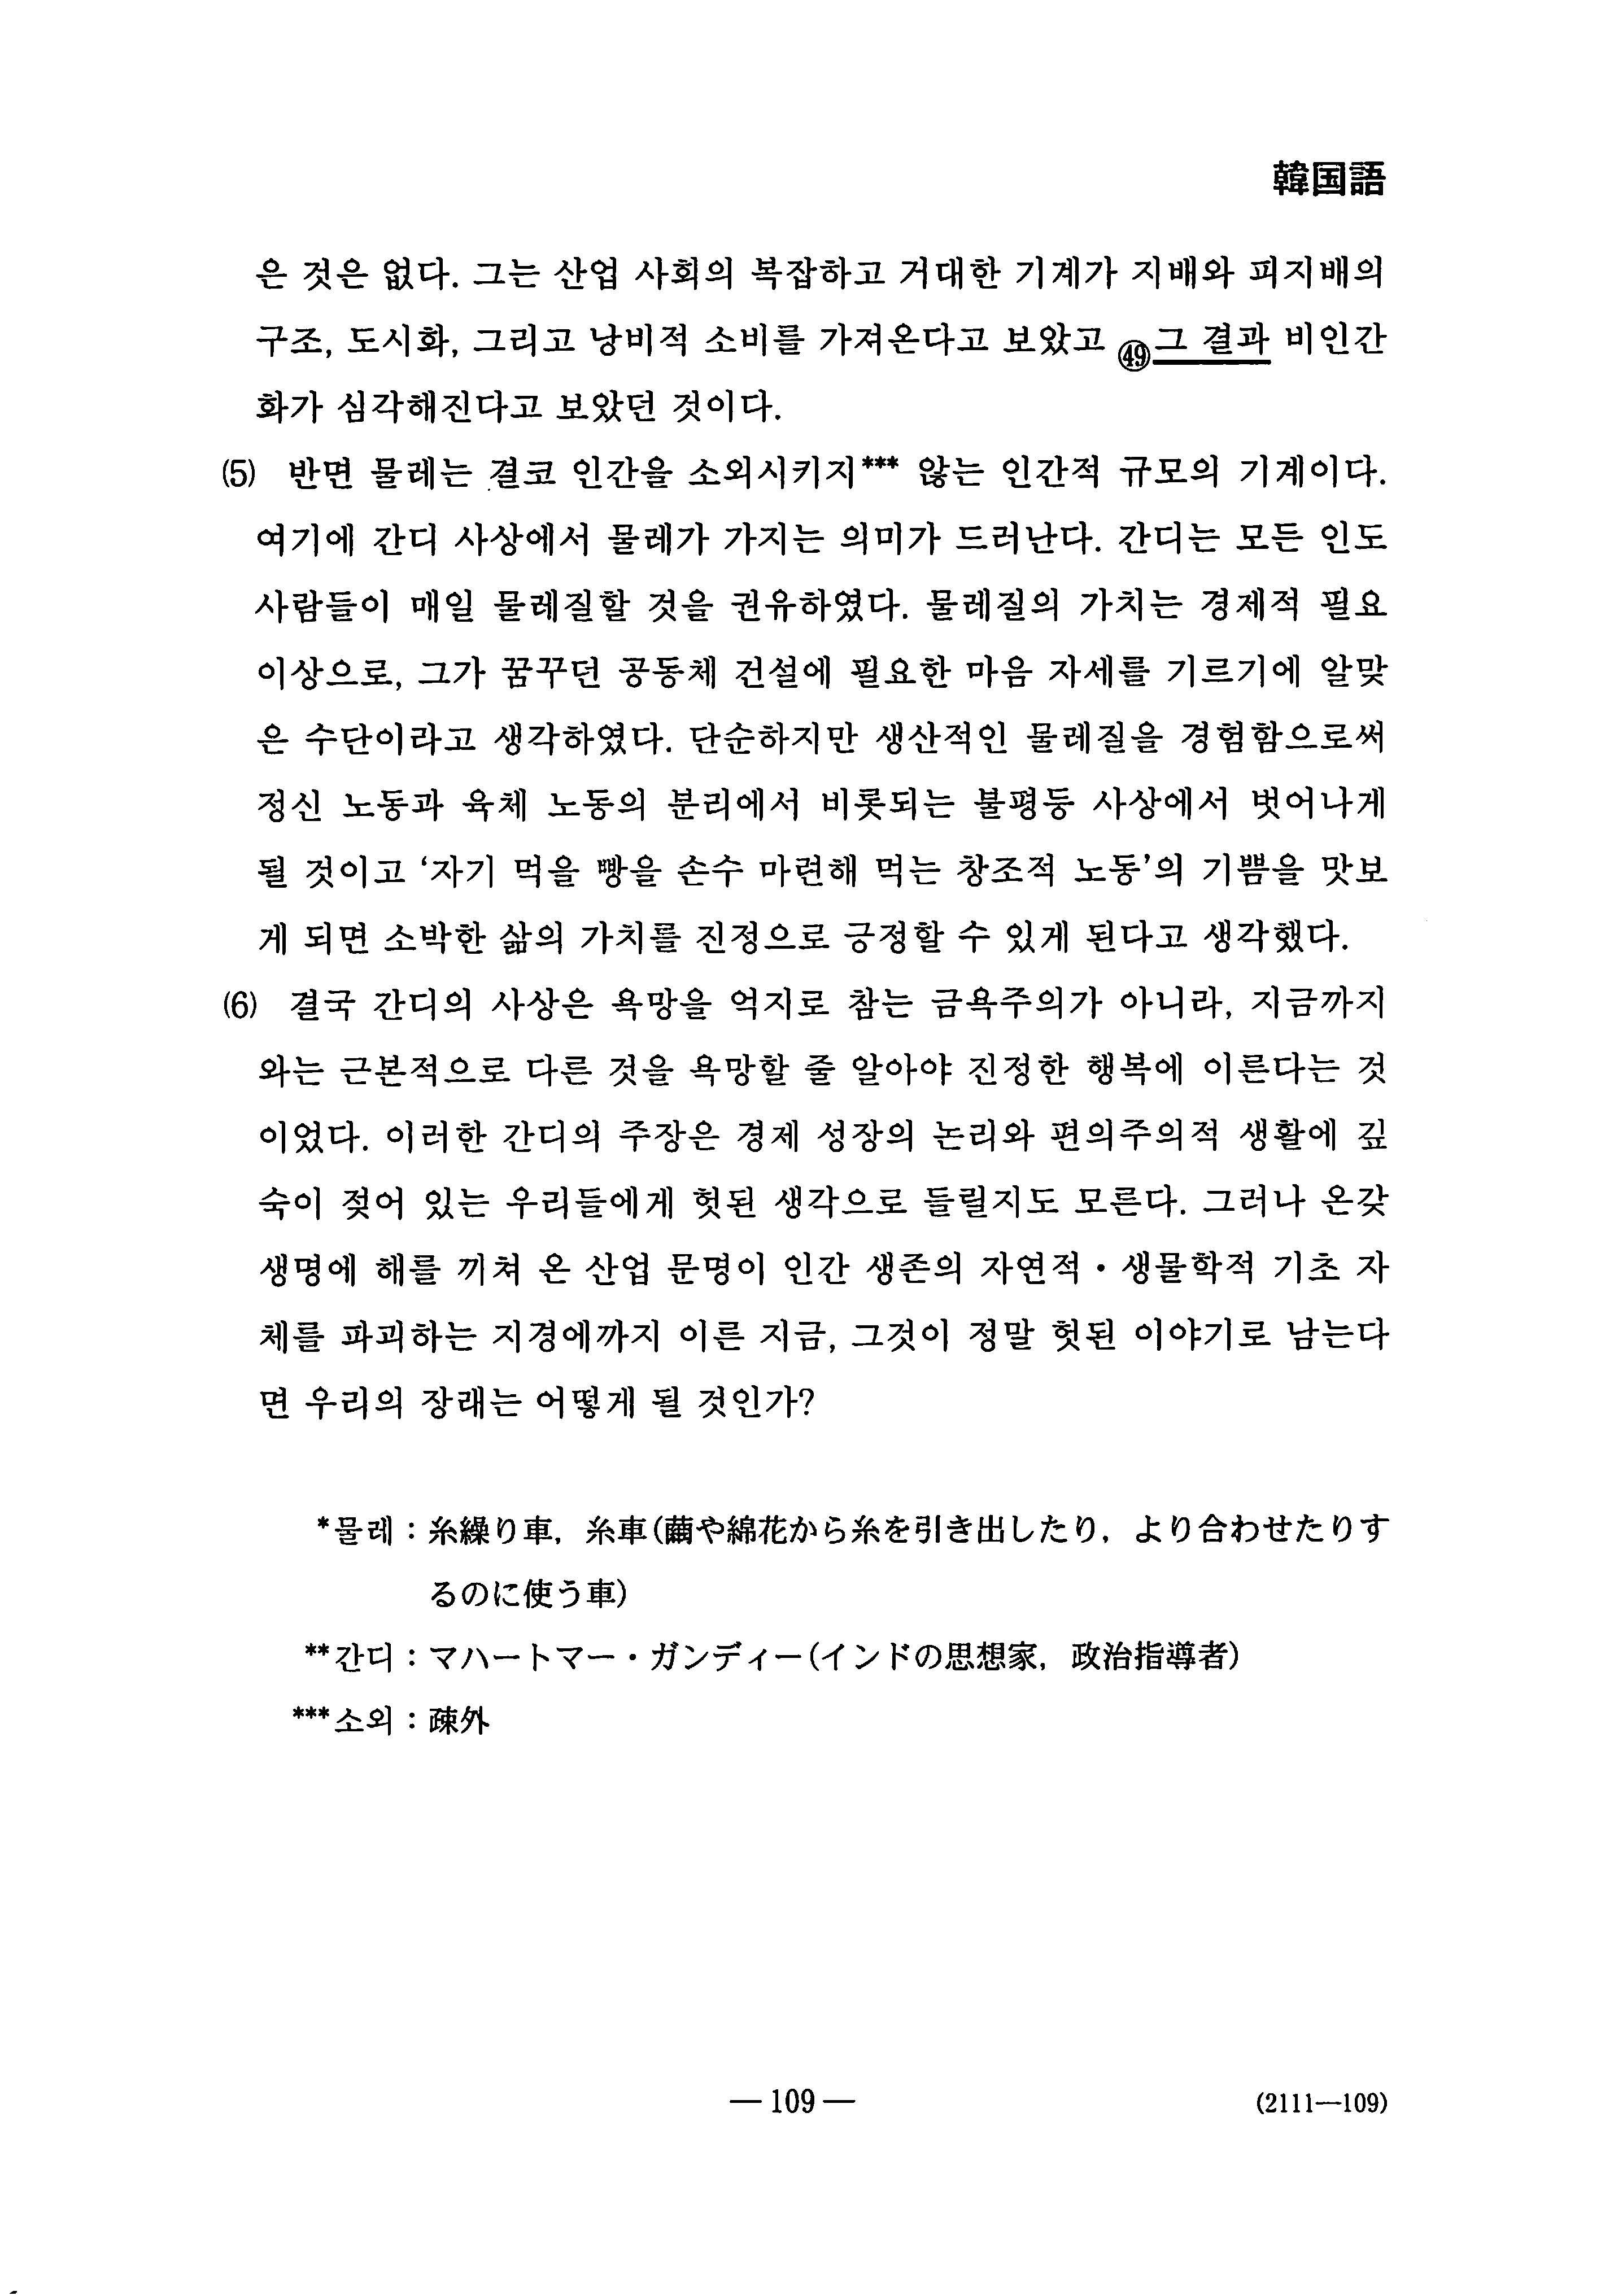 韓国語 外国語|2020年 令和2年 センター試験過去問題